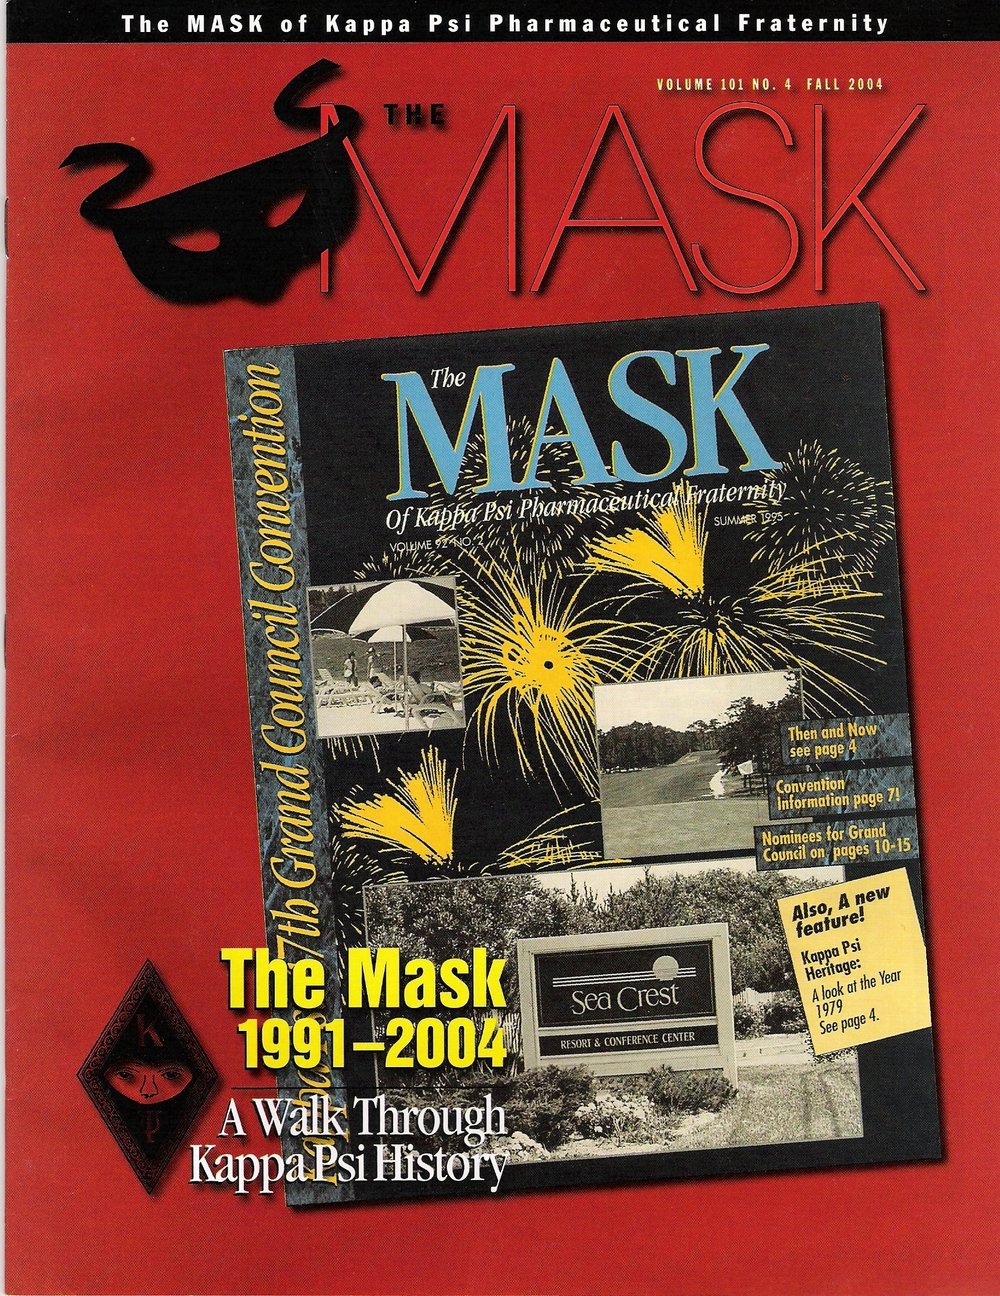 mask_cover_101-4_2004_fall.jpg